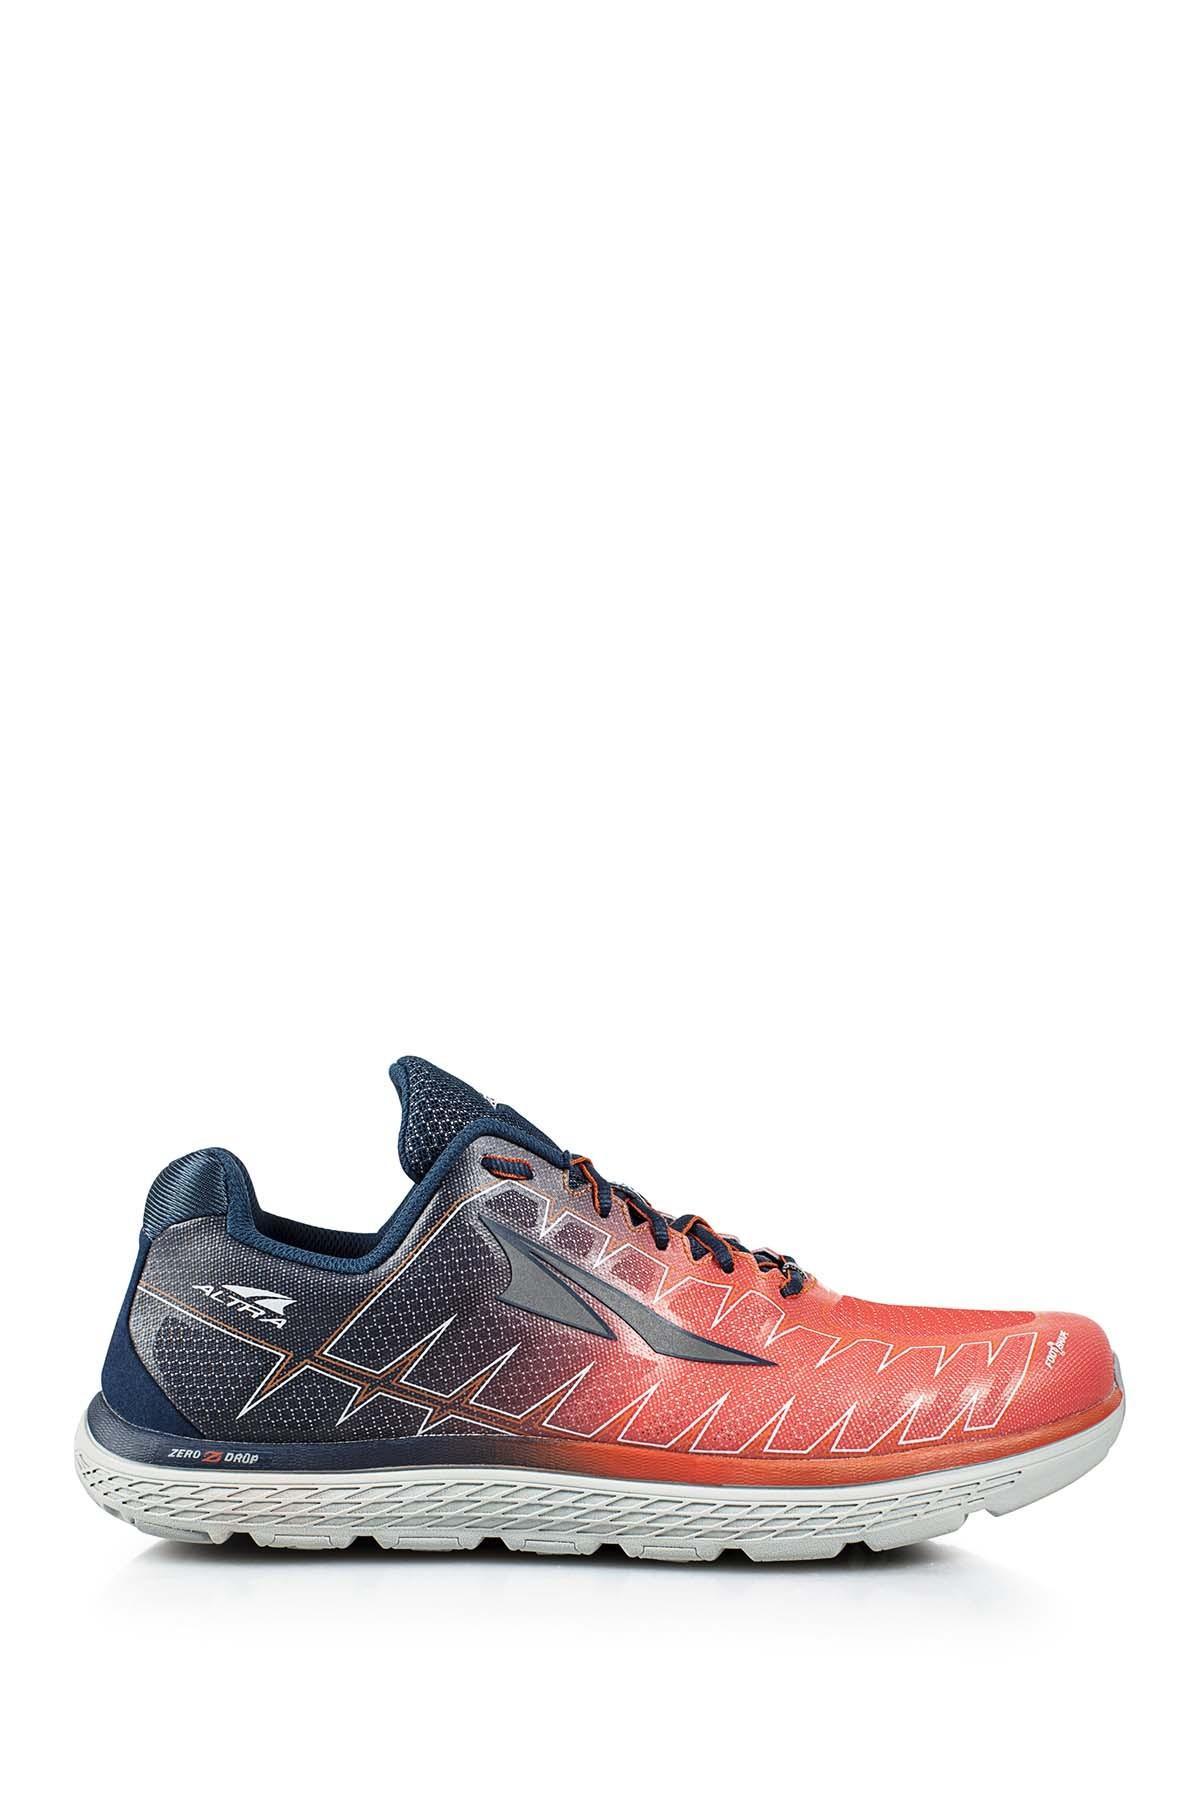 5f1fb8effc7 Altra. Men s Blue One V3 Running Shoe.  131  72 From Nordstrom Rack